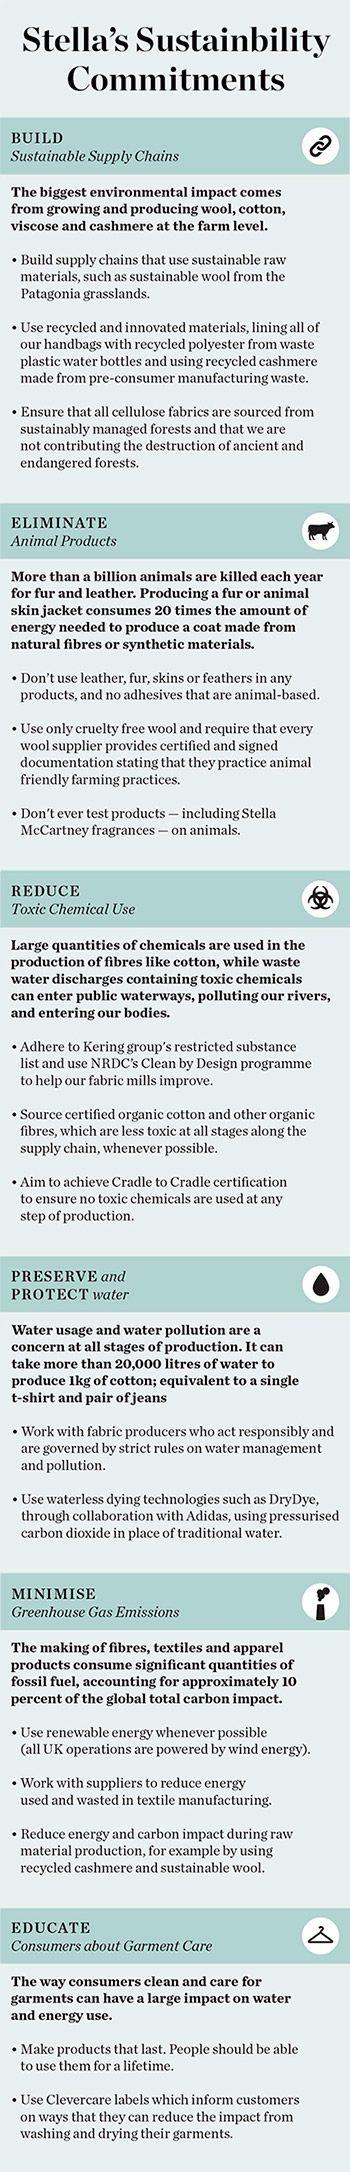 Stella's Sustainability Commitments | Source: BoF